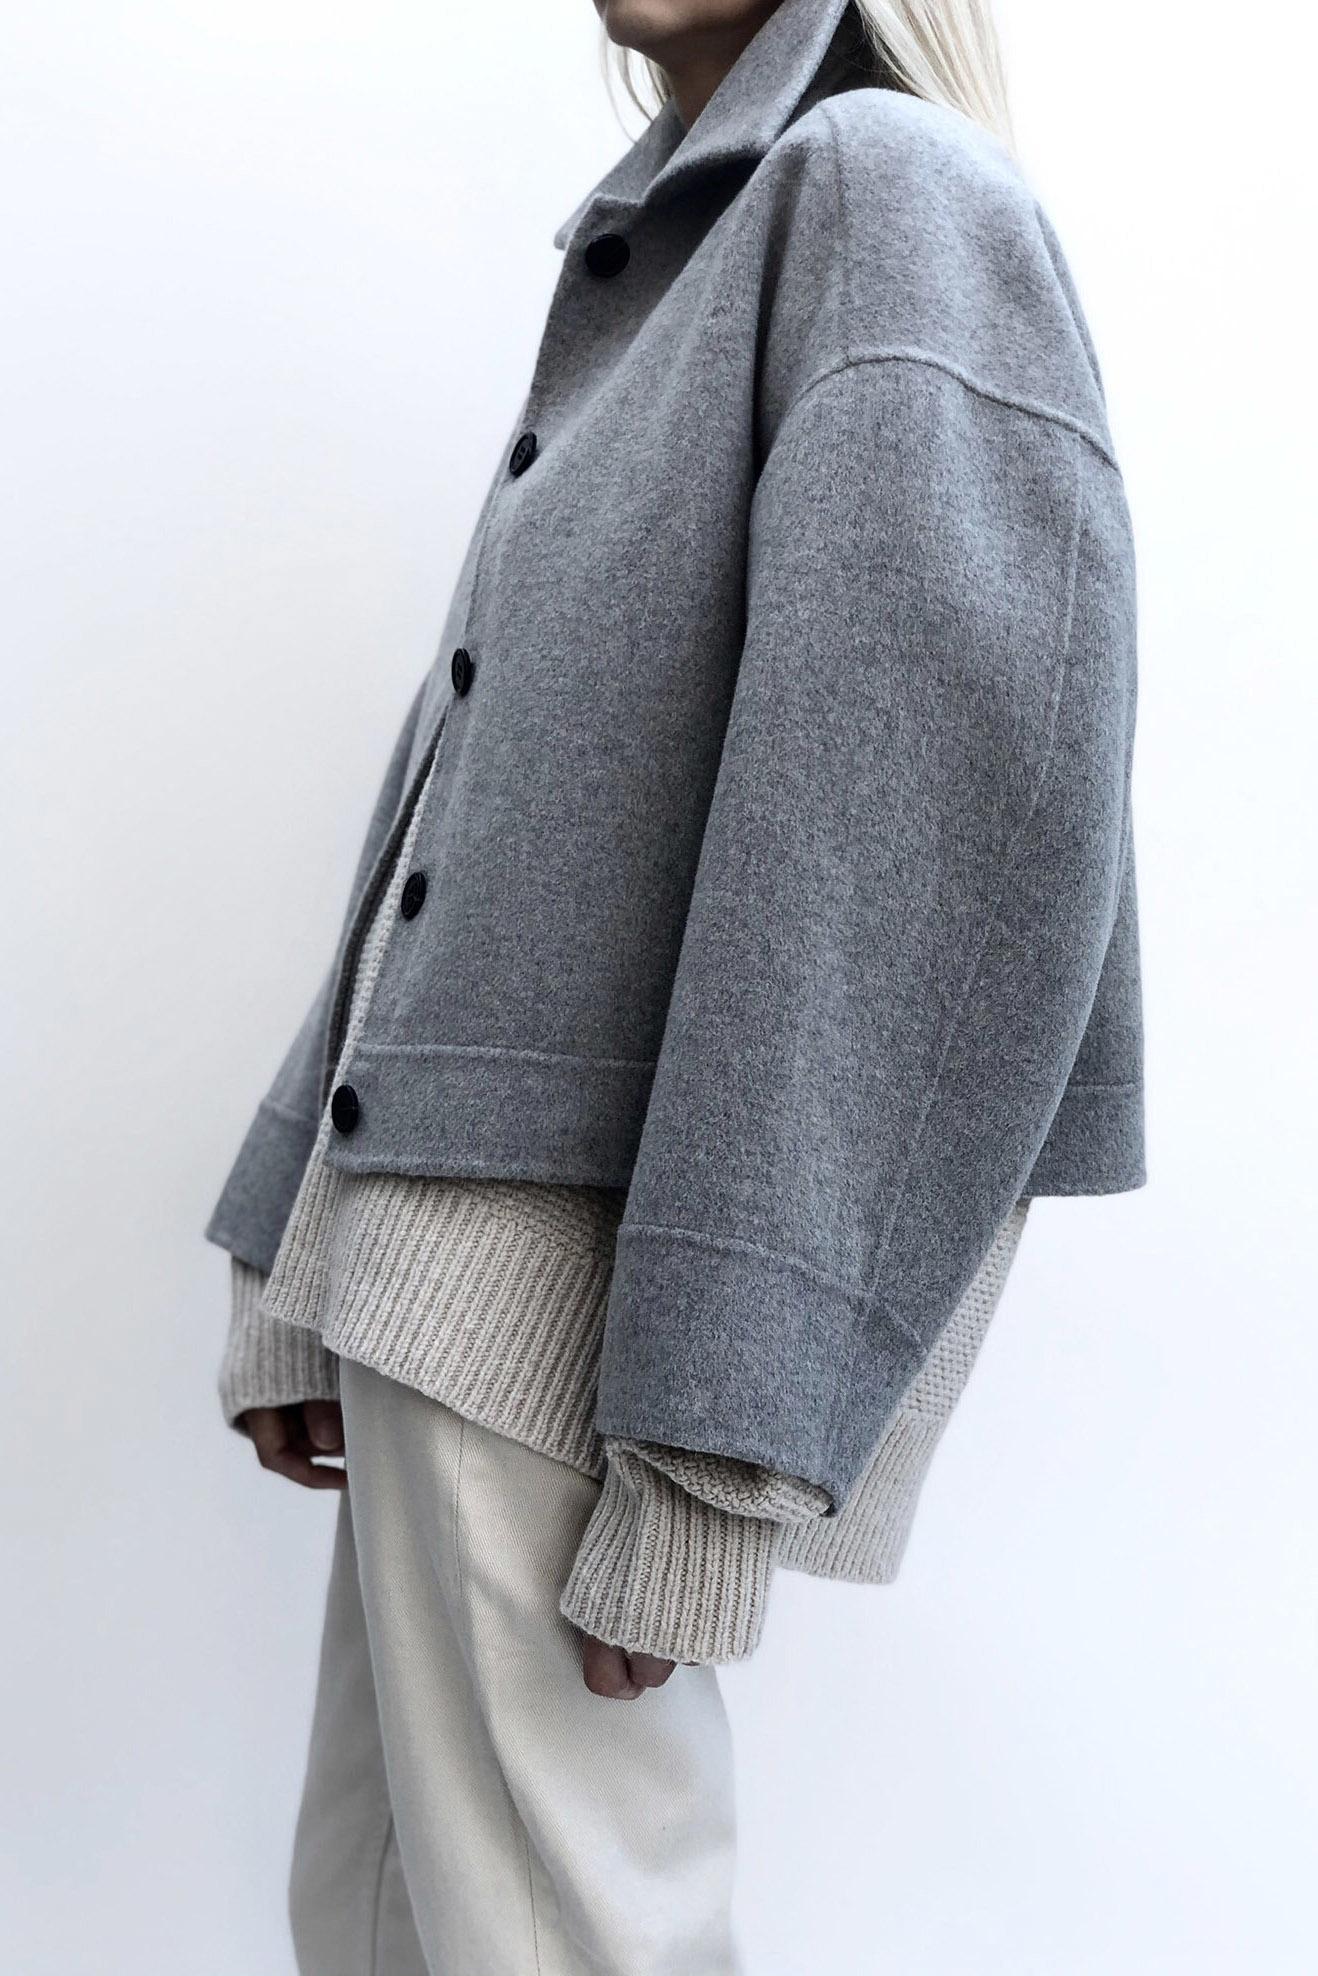 Andy Wool Jacket - Light Grey XS-6